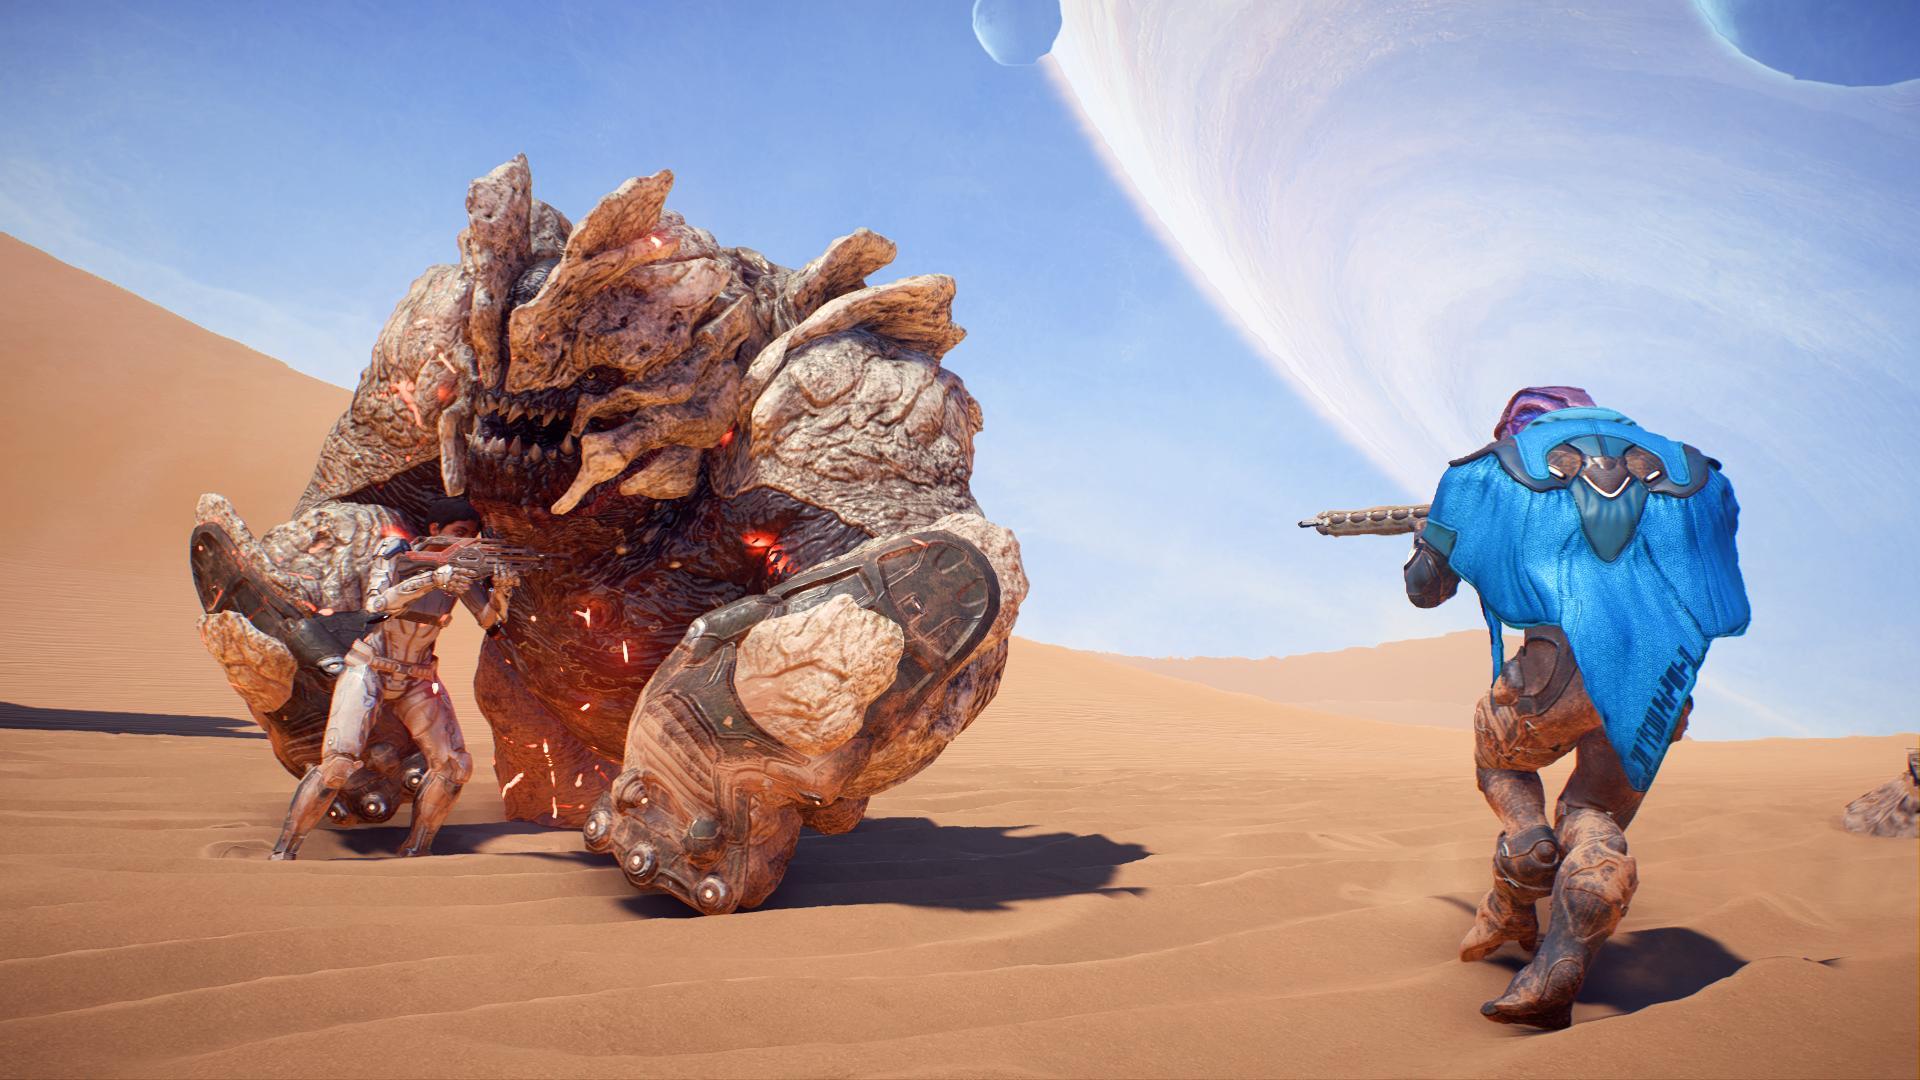 HJVRz8m.jpg - Mass Effect: Andromeda